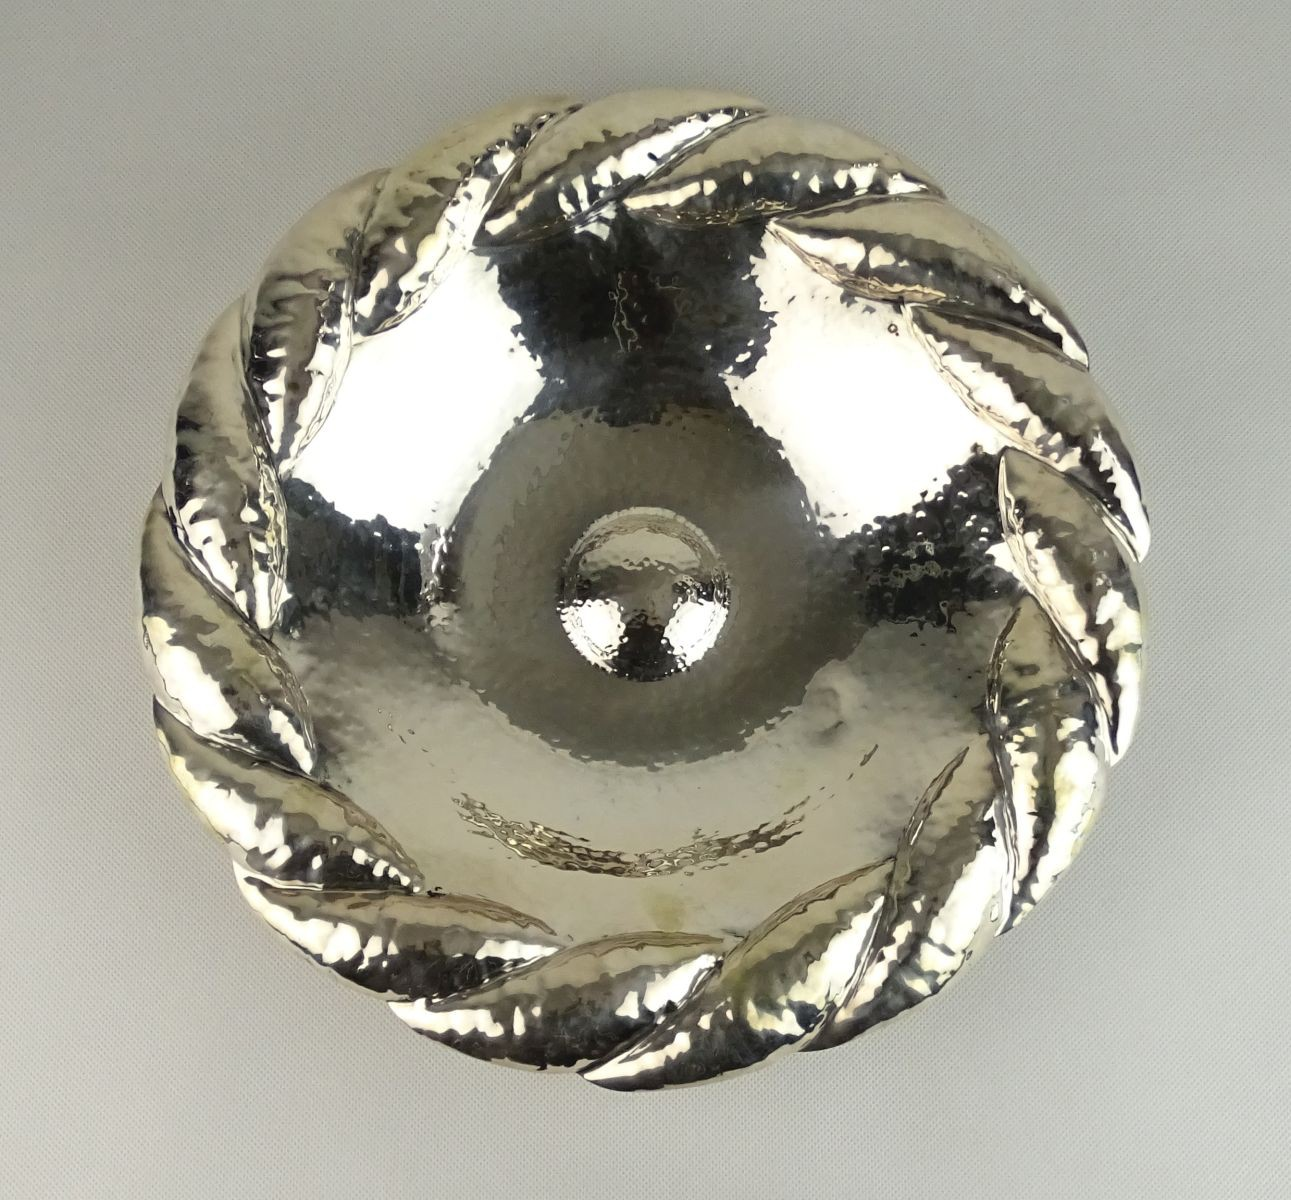 DSC04428.JPG (1291×1200)